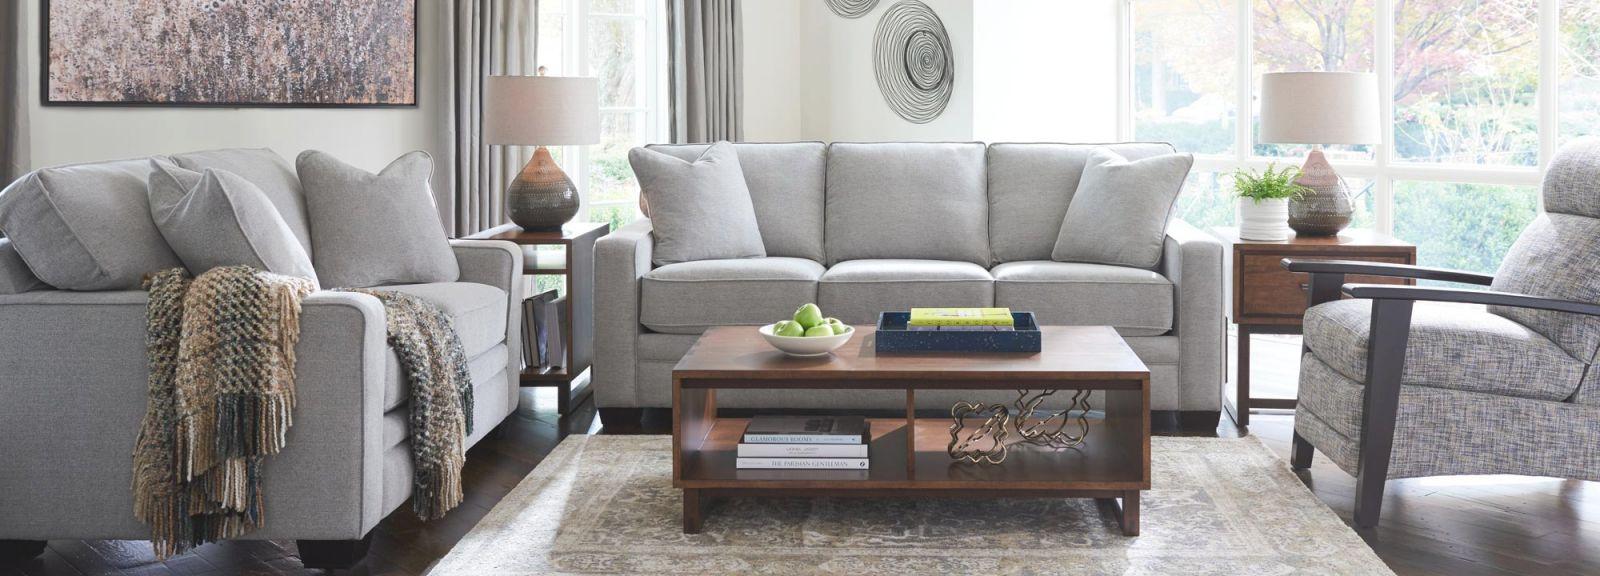 La-Z-Boy Living Room Furniture   Knight Furniture pertaining to Lazy Boy Living Room Furniture